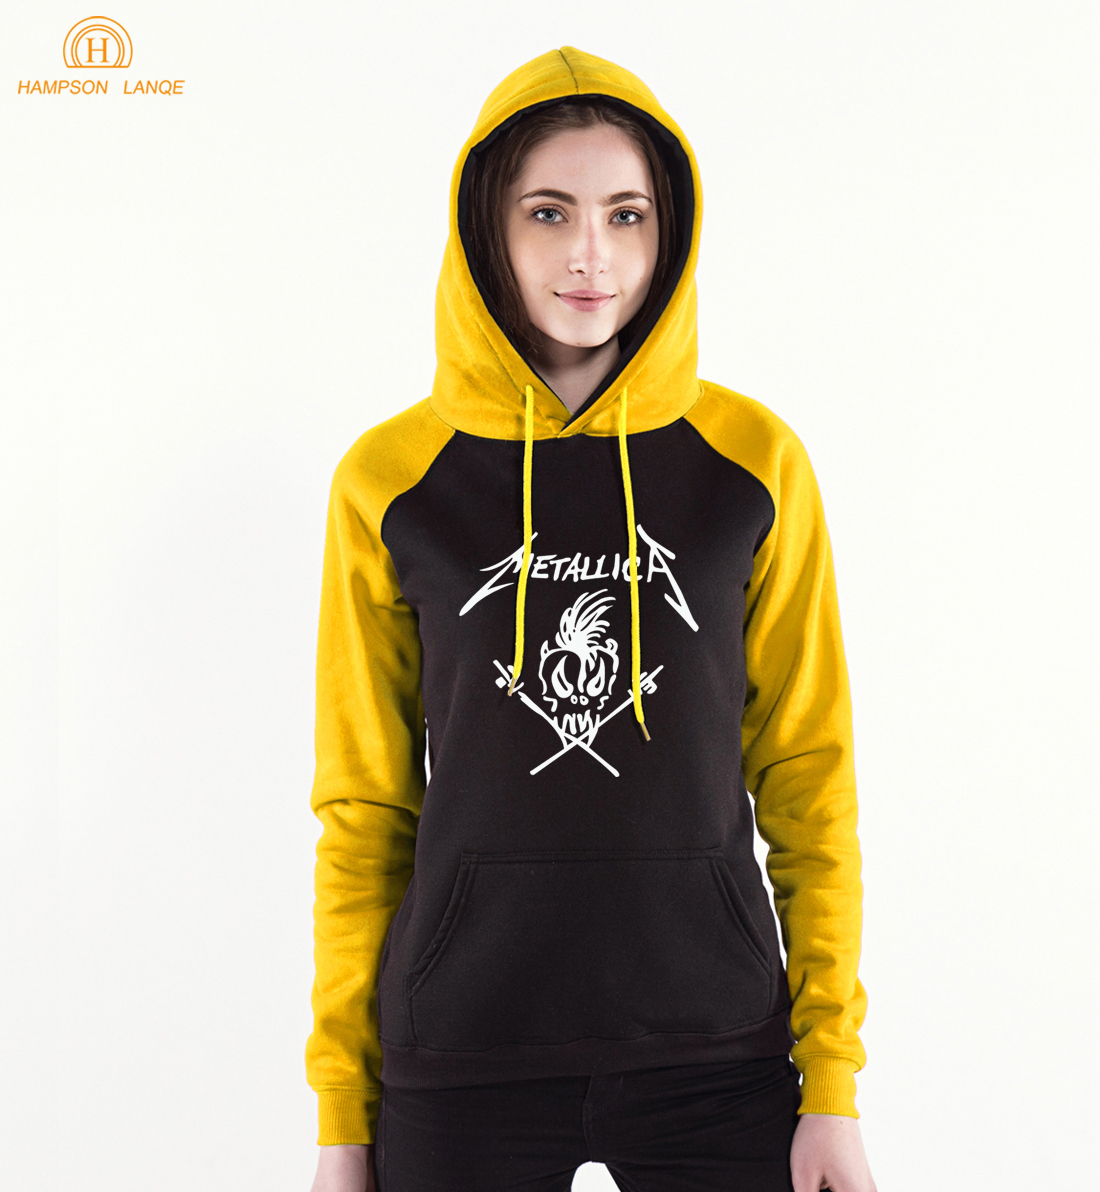 Thrash Metal Band Rock And Roll Hip Hop Women's Hoodies 2019 Spring Autumn Sweatshirts Women Punk Style Raglan Hoodie For Adult